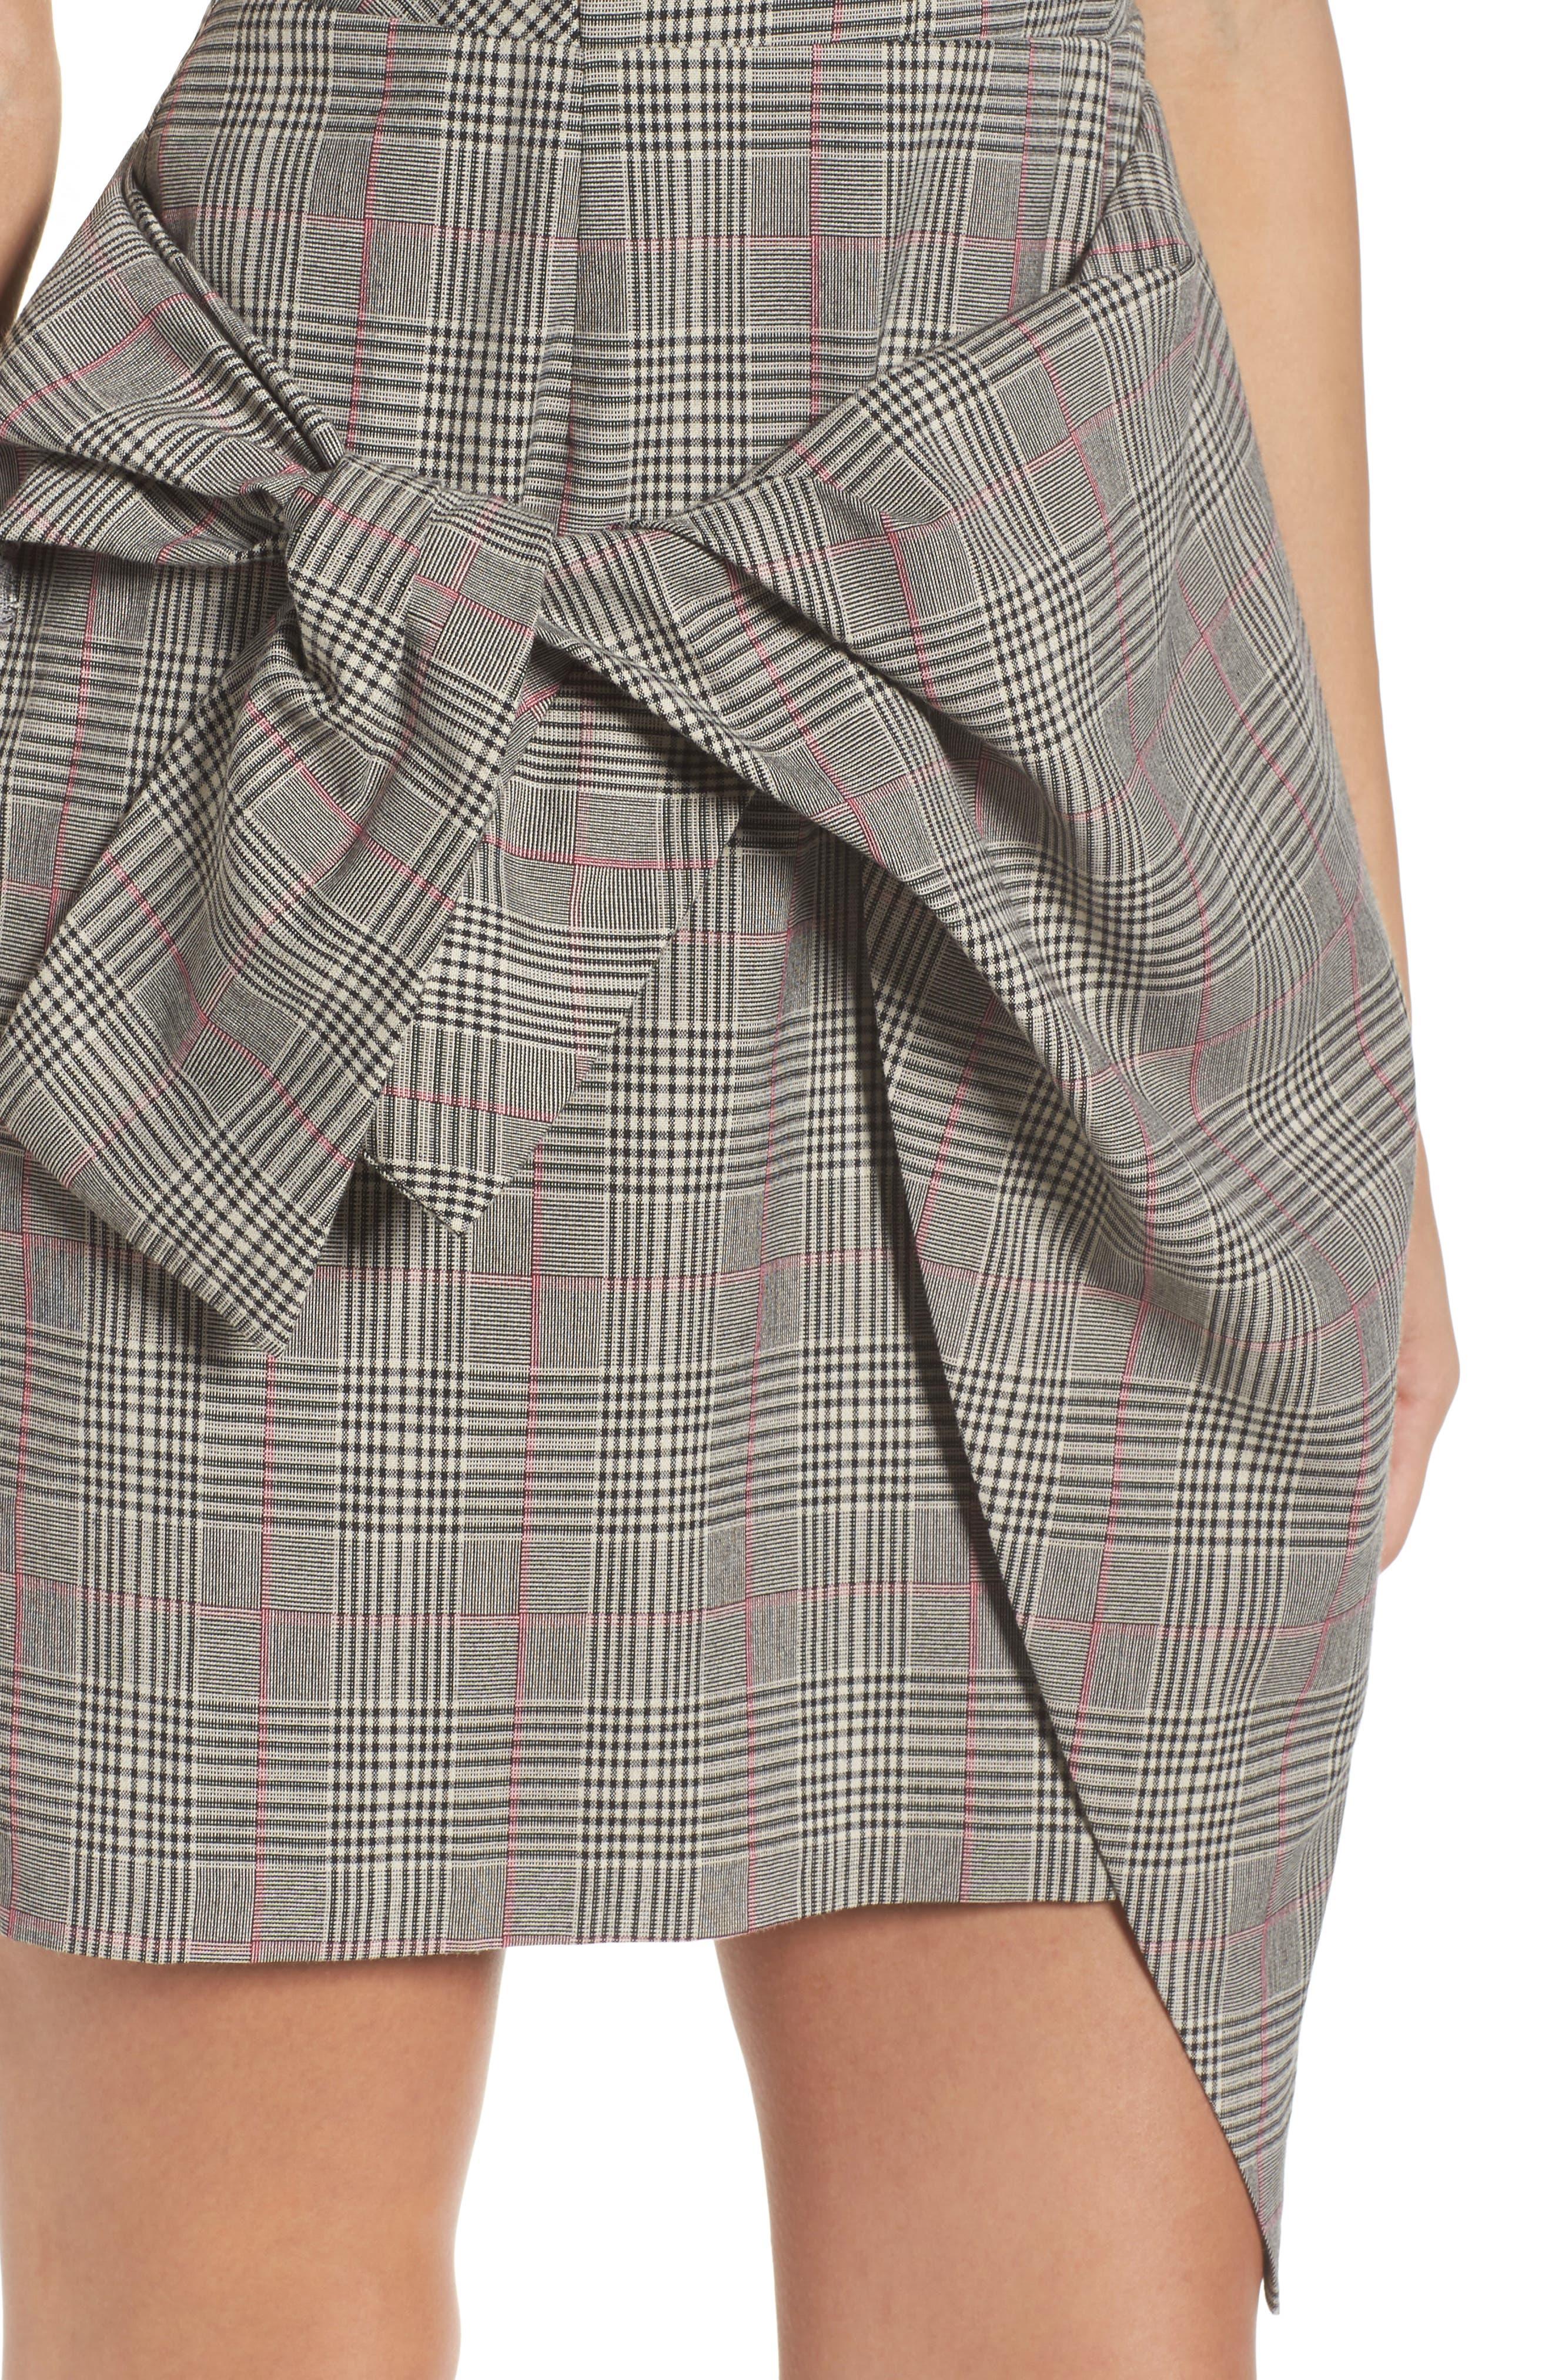 Aurora Plaid Tie Sheath,                             Alternate thumbnail 4, color,                             Black/ Grey/ Red